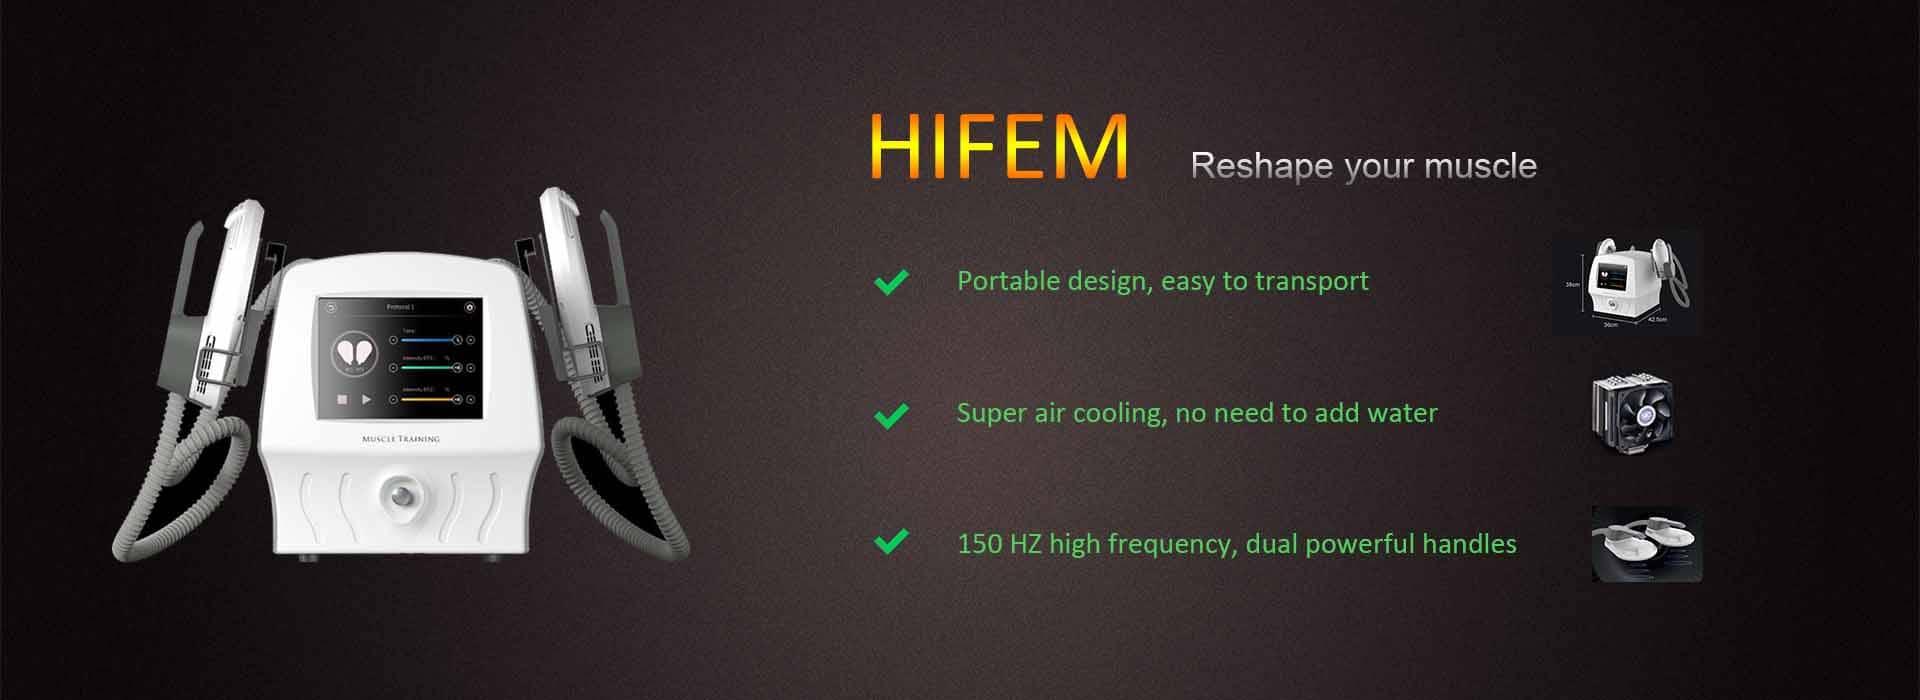 HIFEM machine promotion